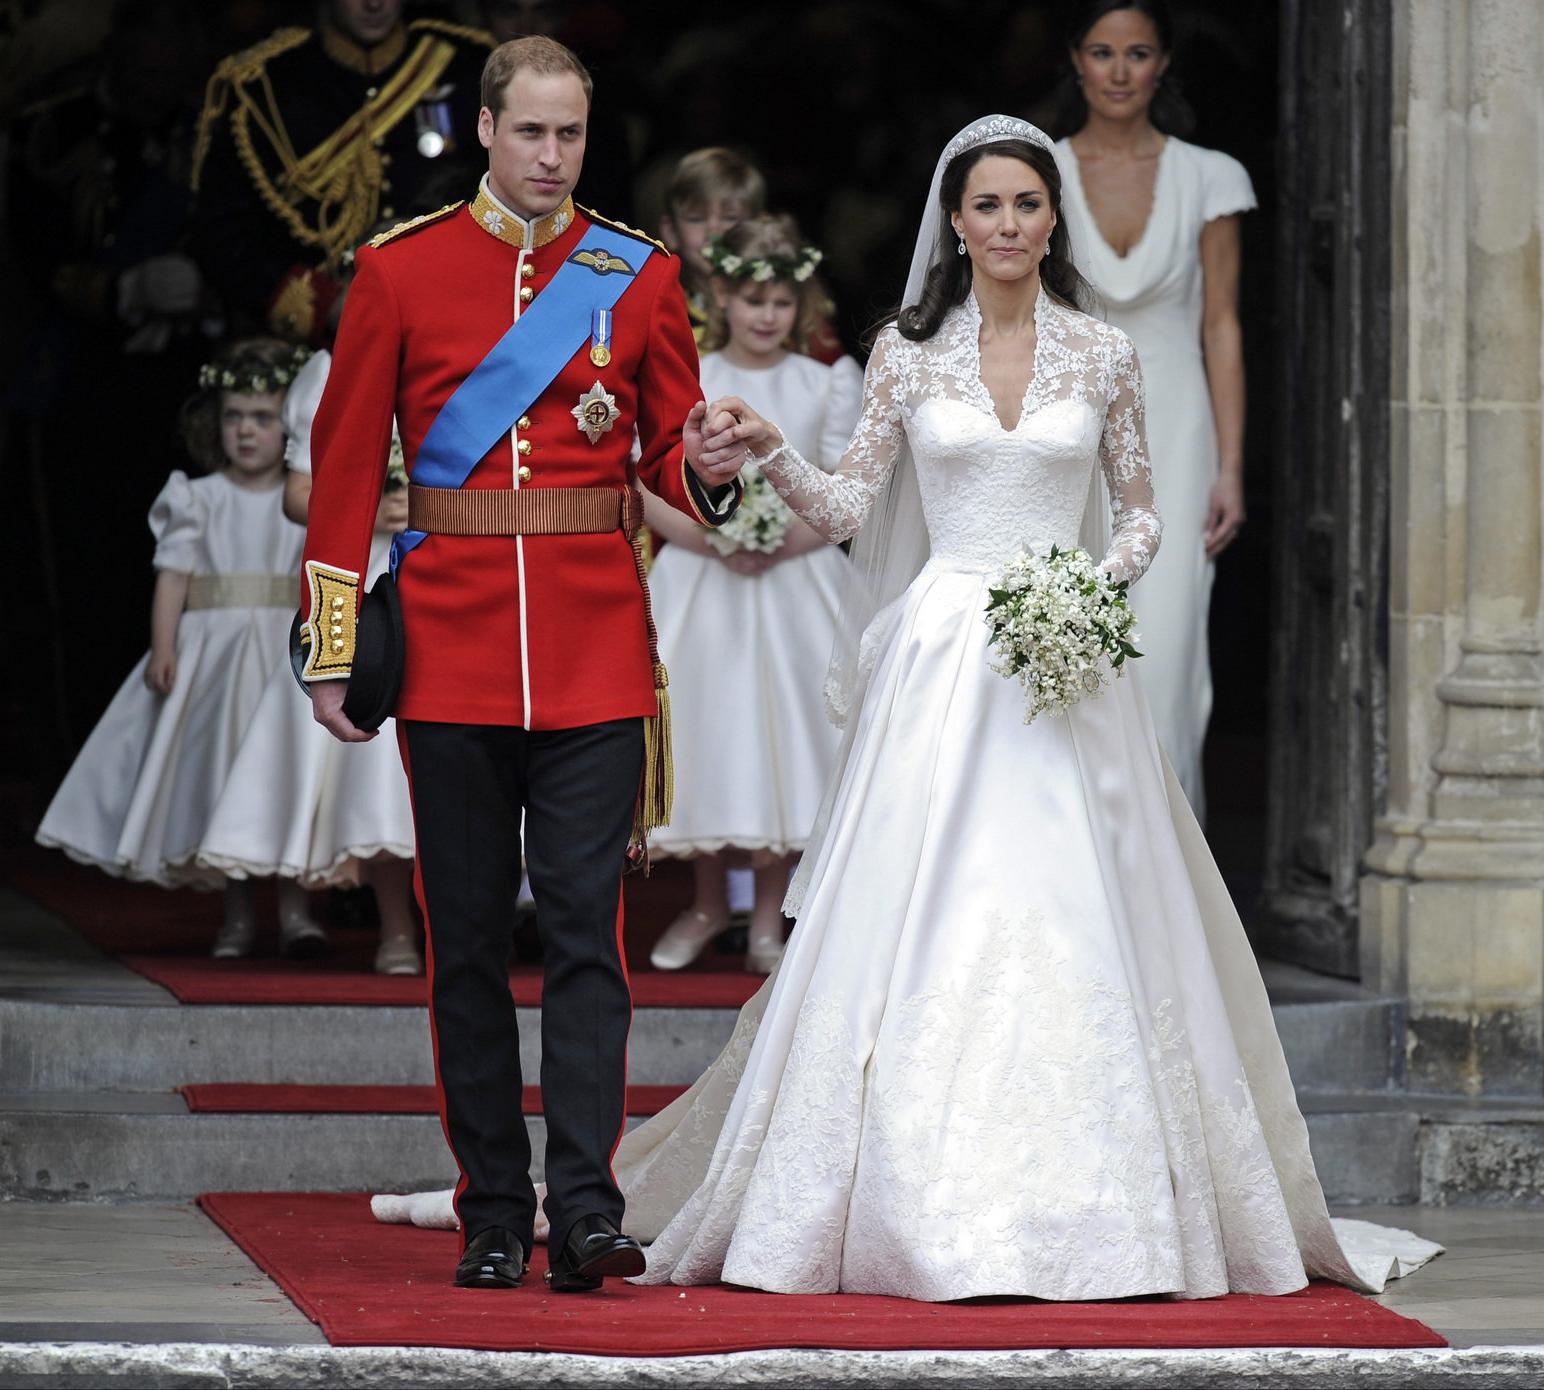 Dressybridal Whose Royal Wedding Dress Is Your Favorite